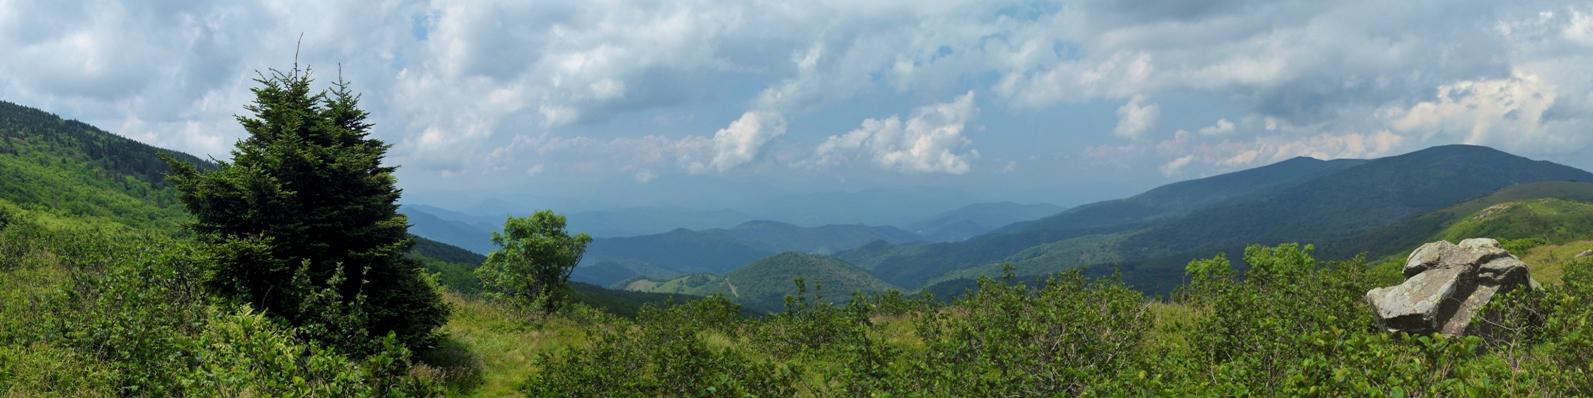 appalachian blue ridge mountains wallpaper - photo #12